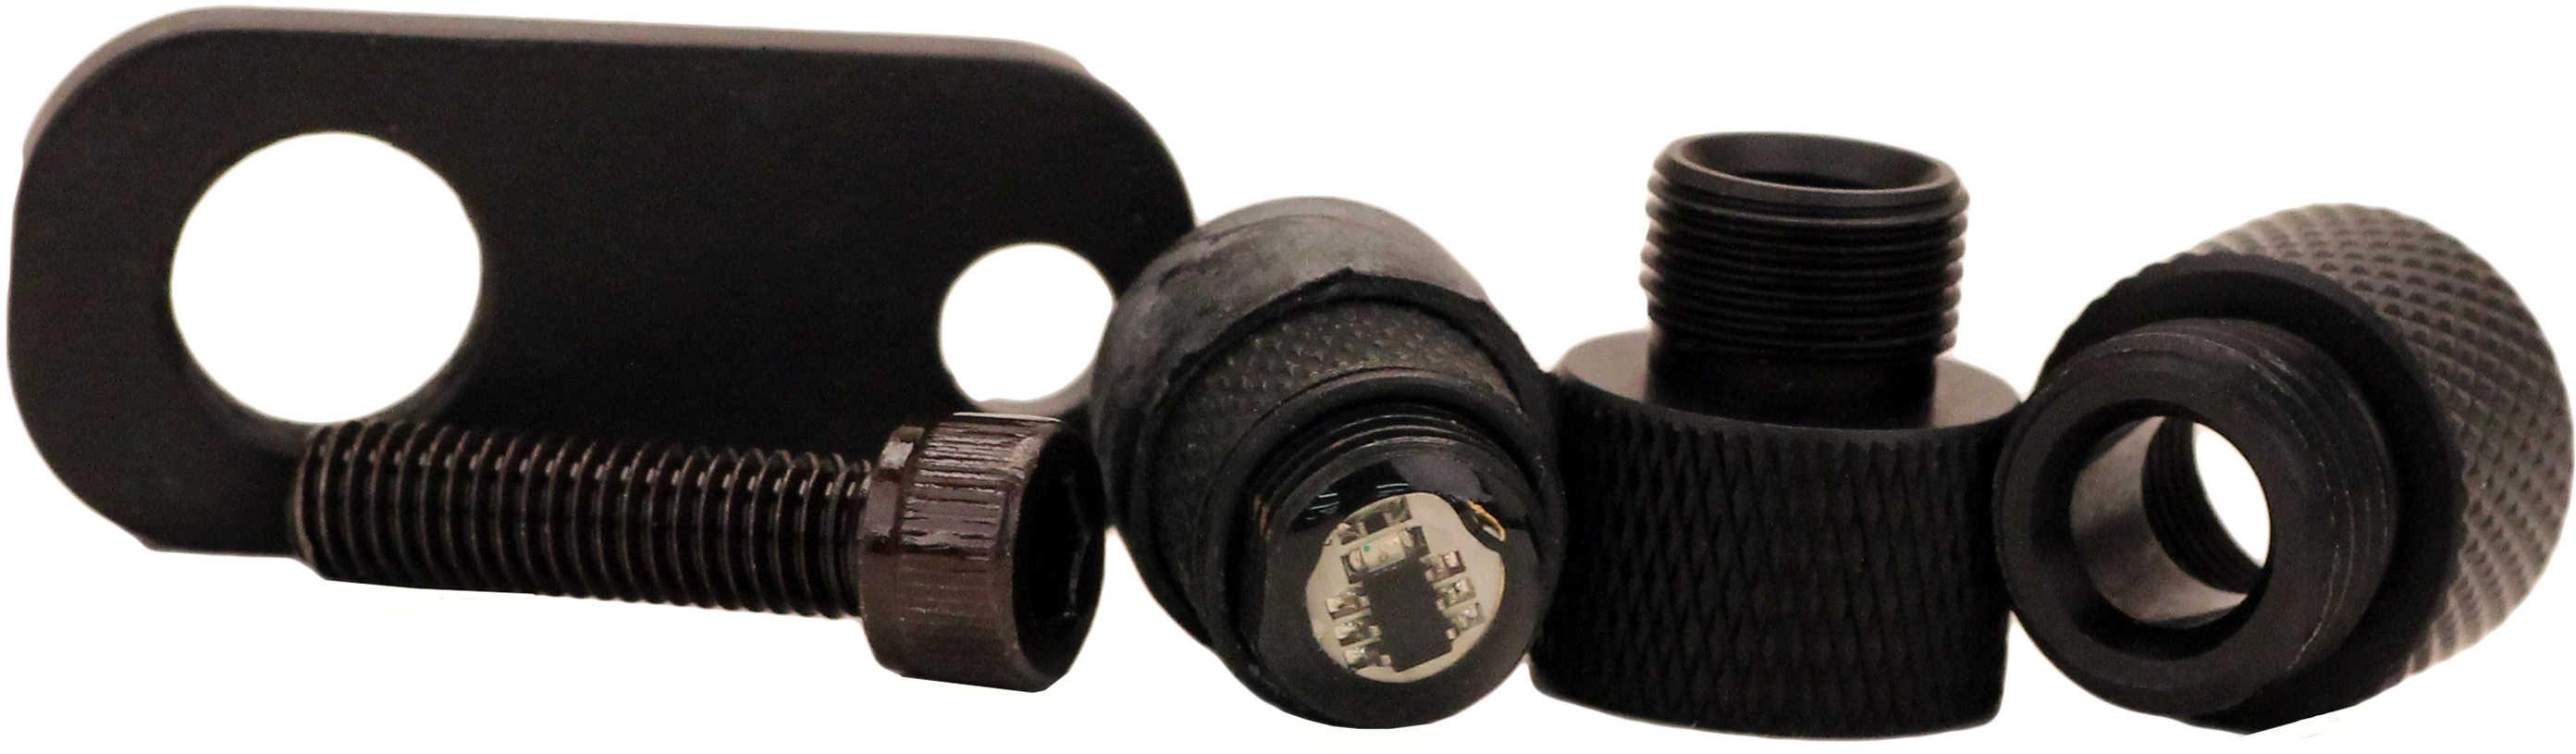 Apex Micro-Pro Sight Light Adjustable Model: AG452B